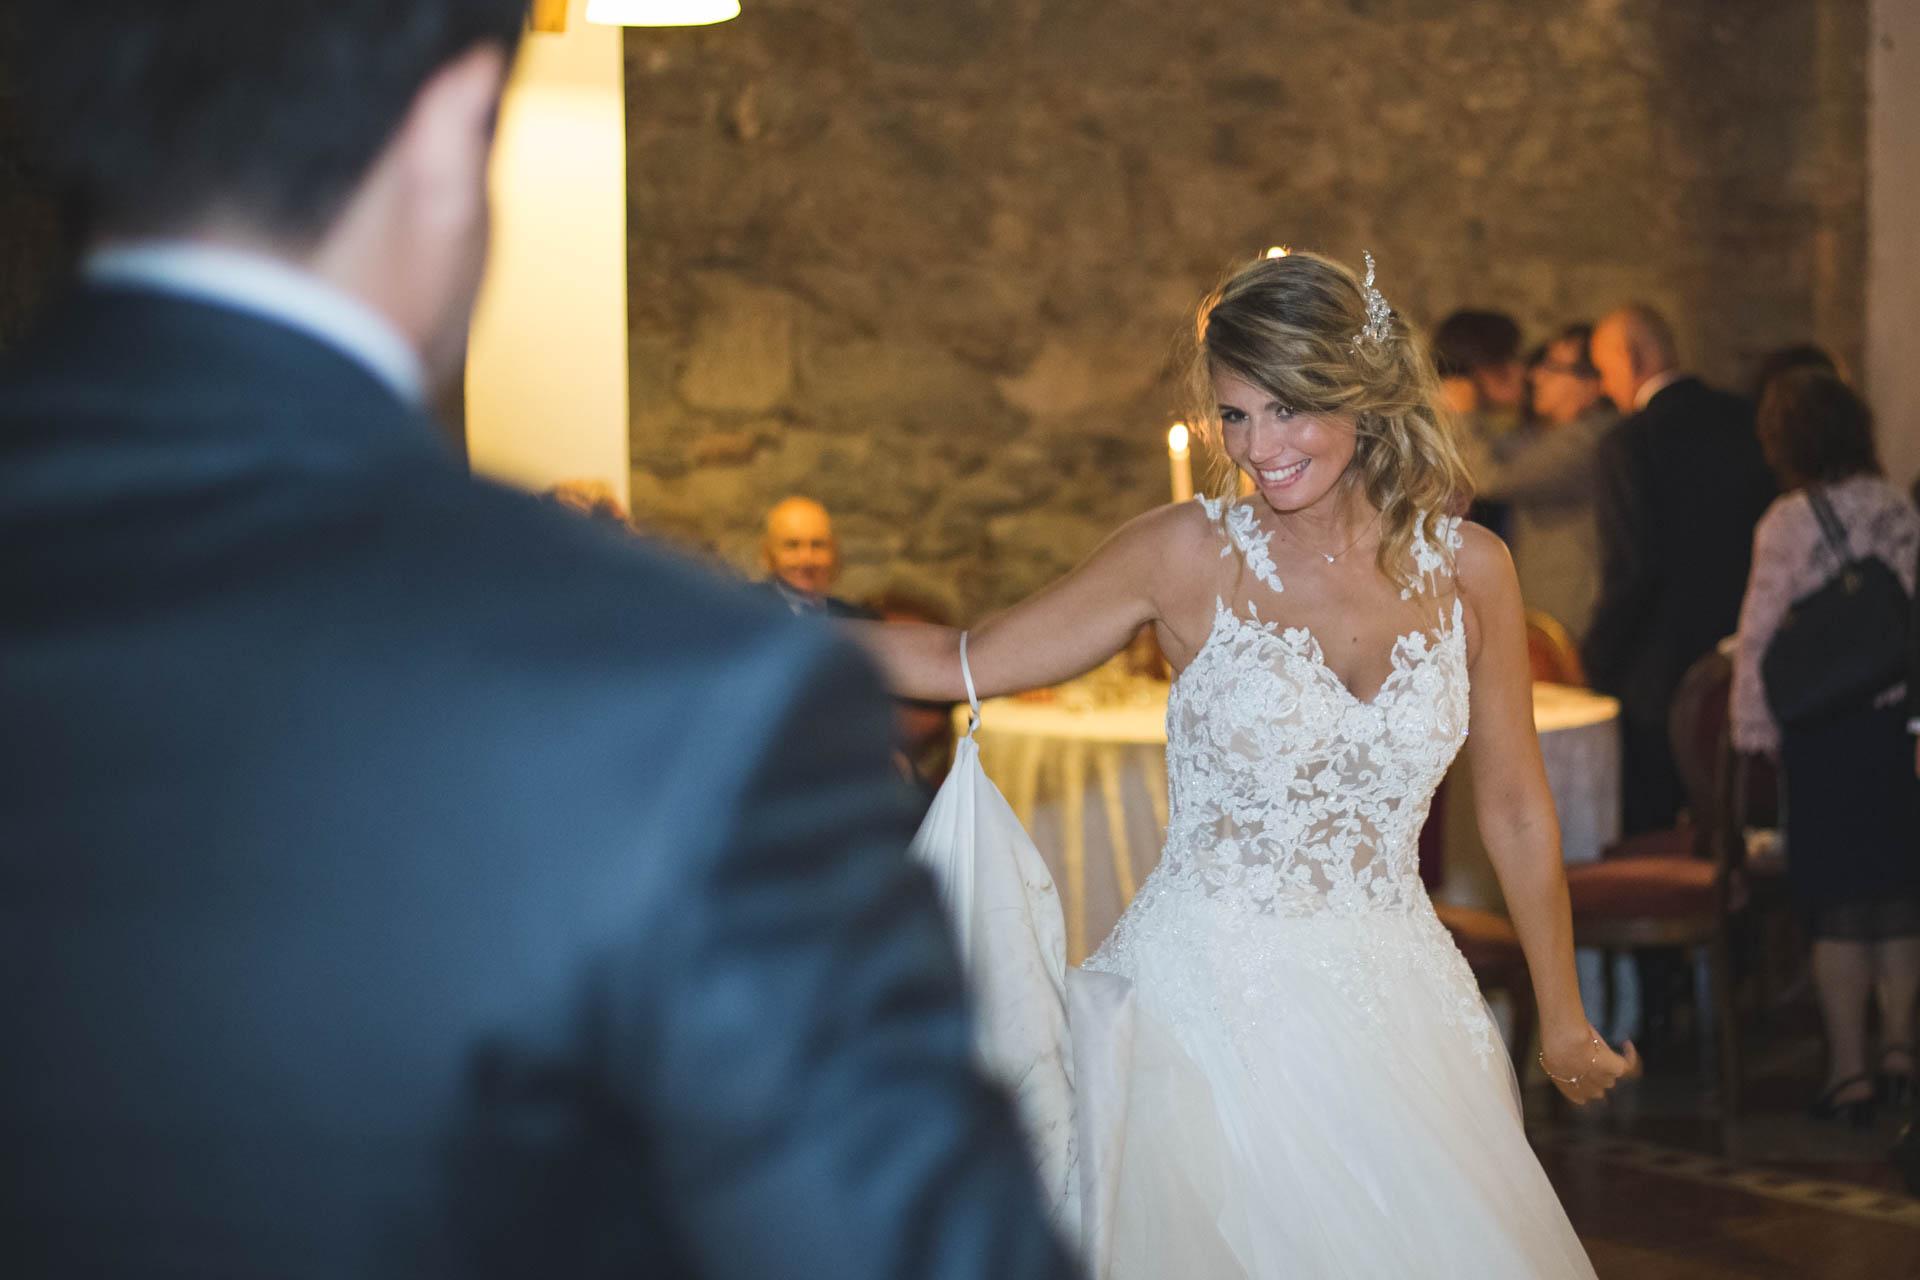 sposa sorriso ballo ricevimento